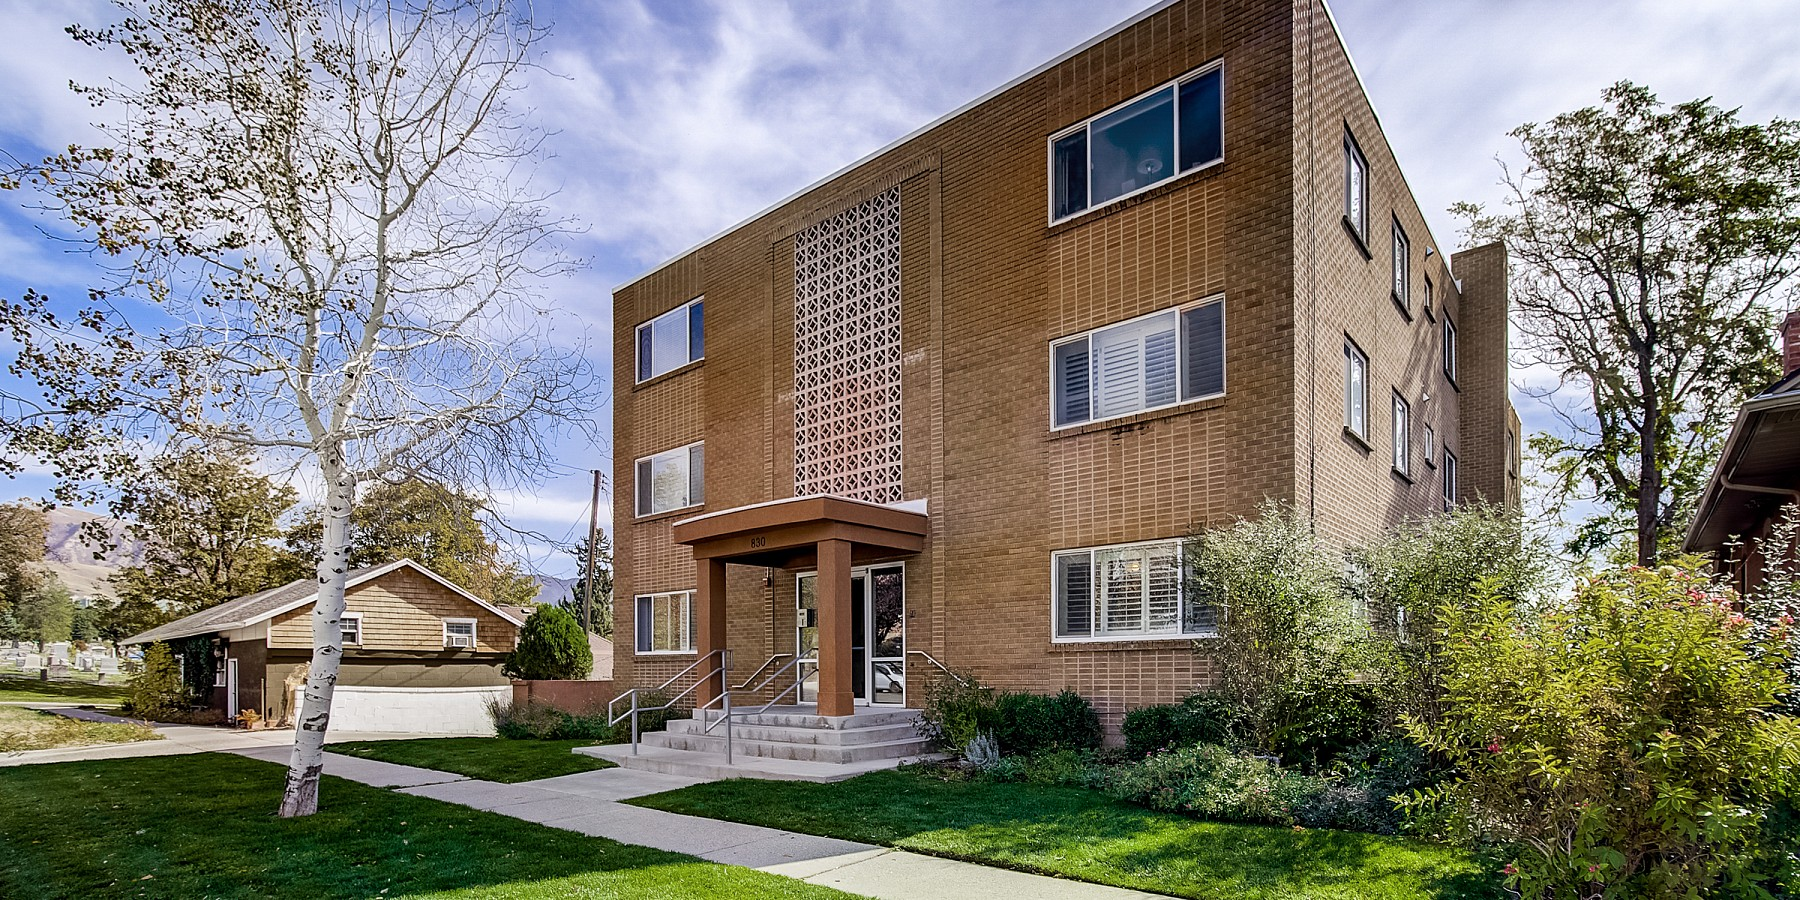 830 E. 6th Avenue #3, Salt Lake City, UT 84103